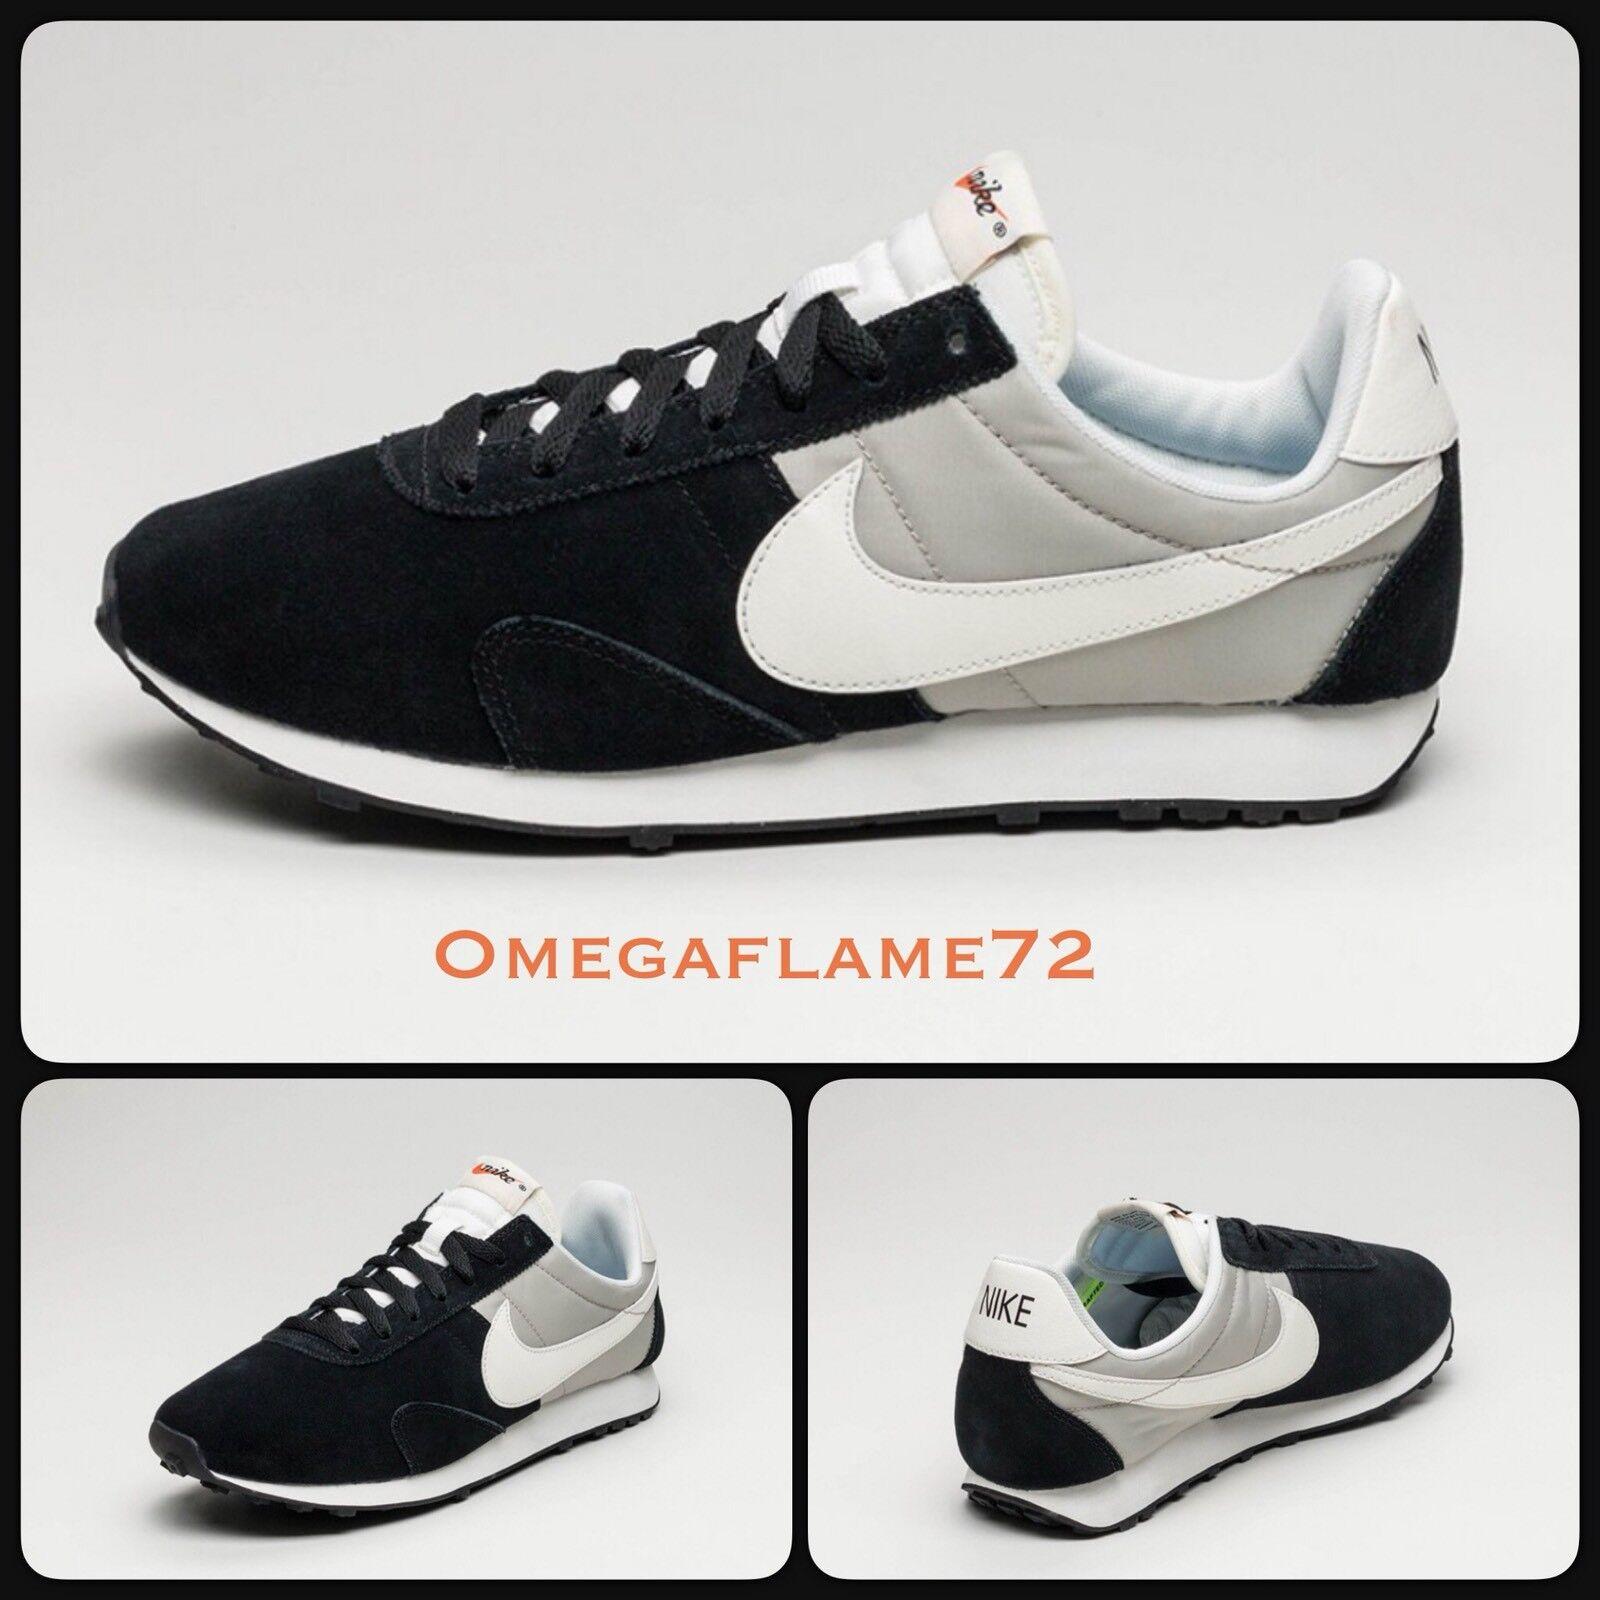 Nike Pre Montreal '17, 898031-001,9.5, EU 44.5, US 10.5,noirPaleGris